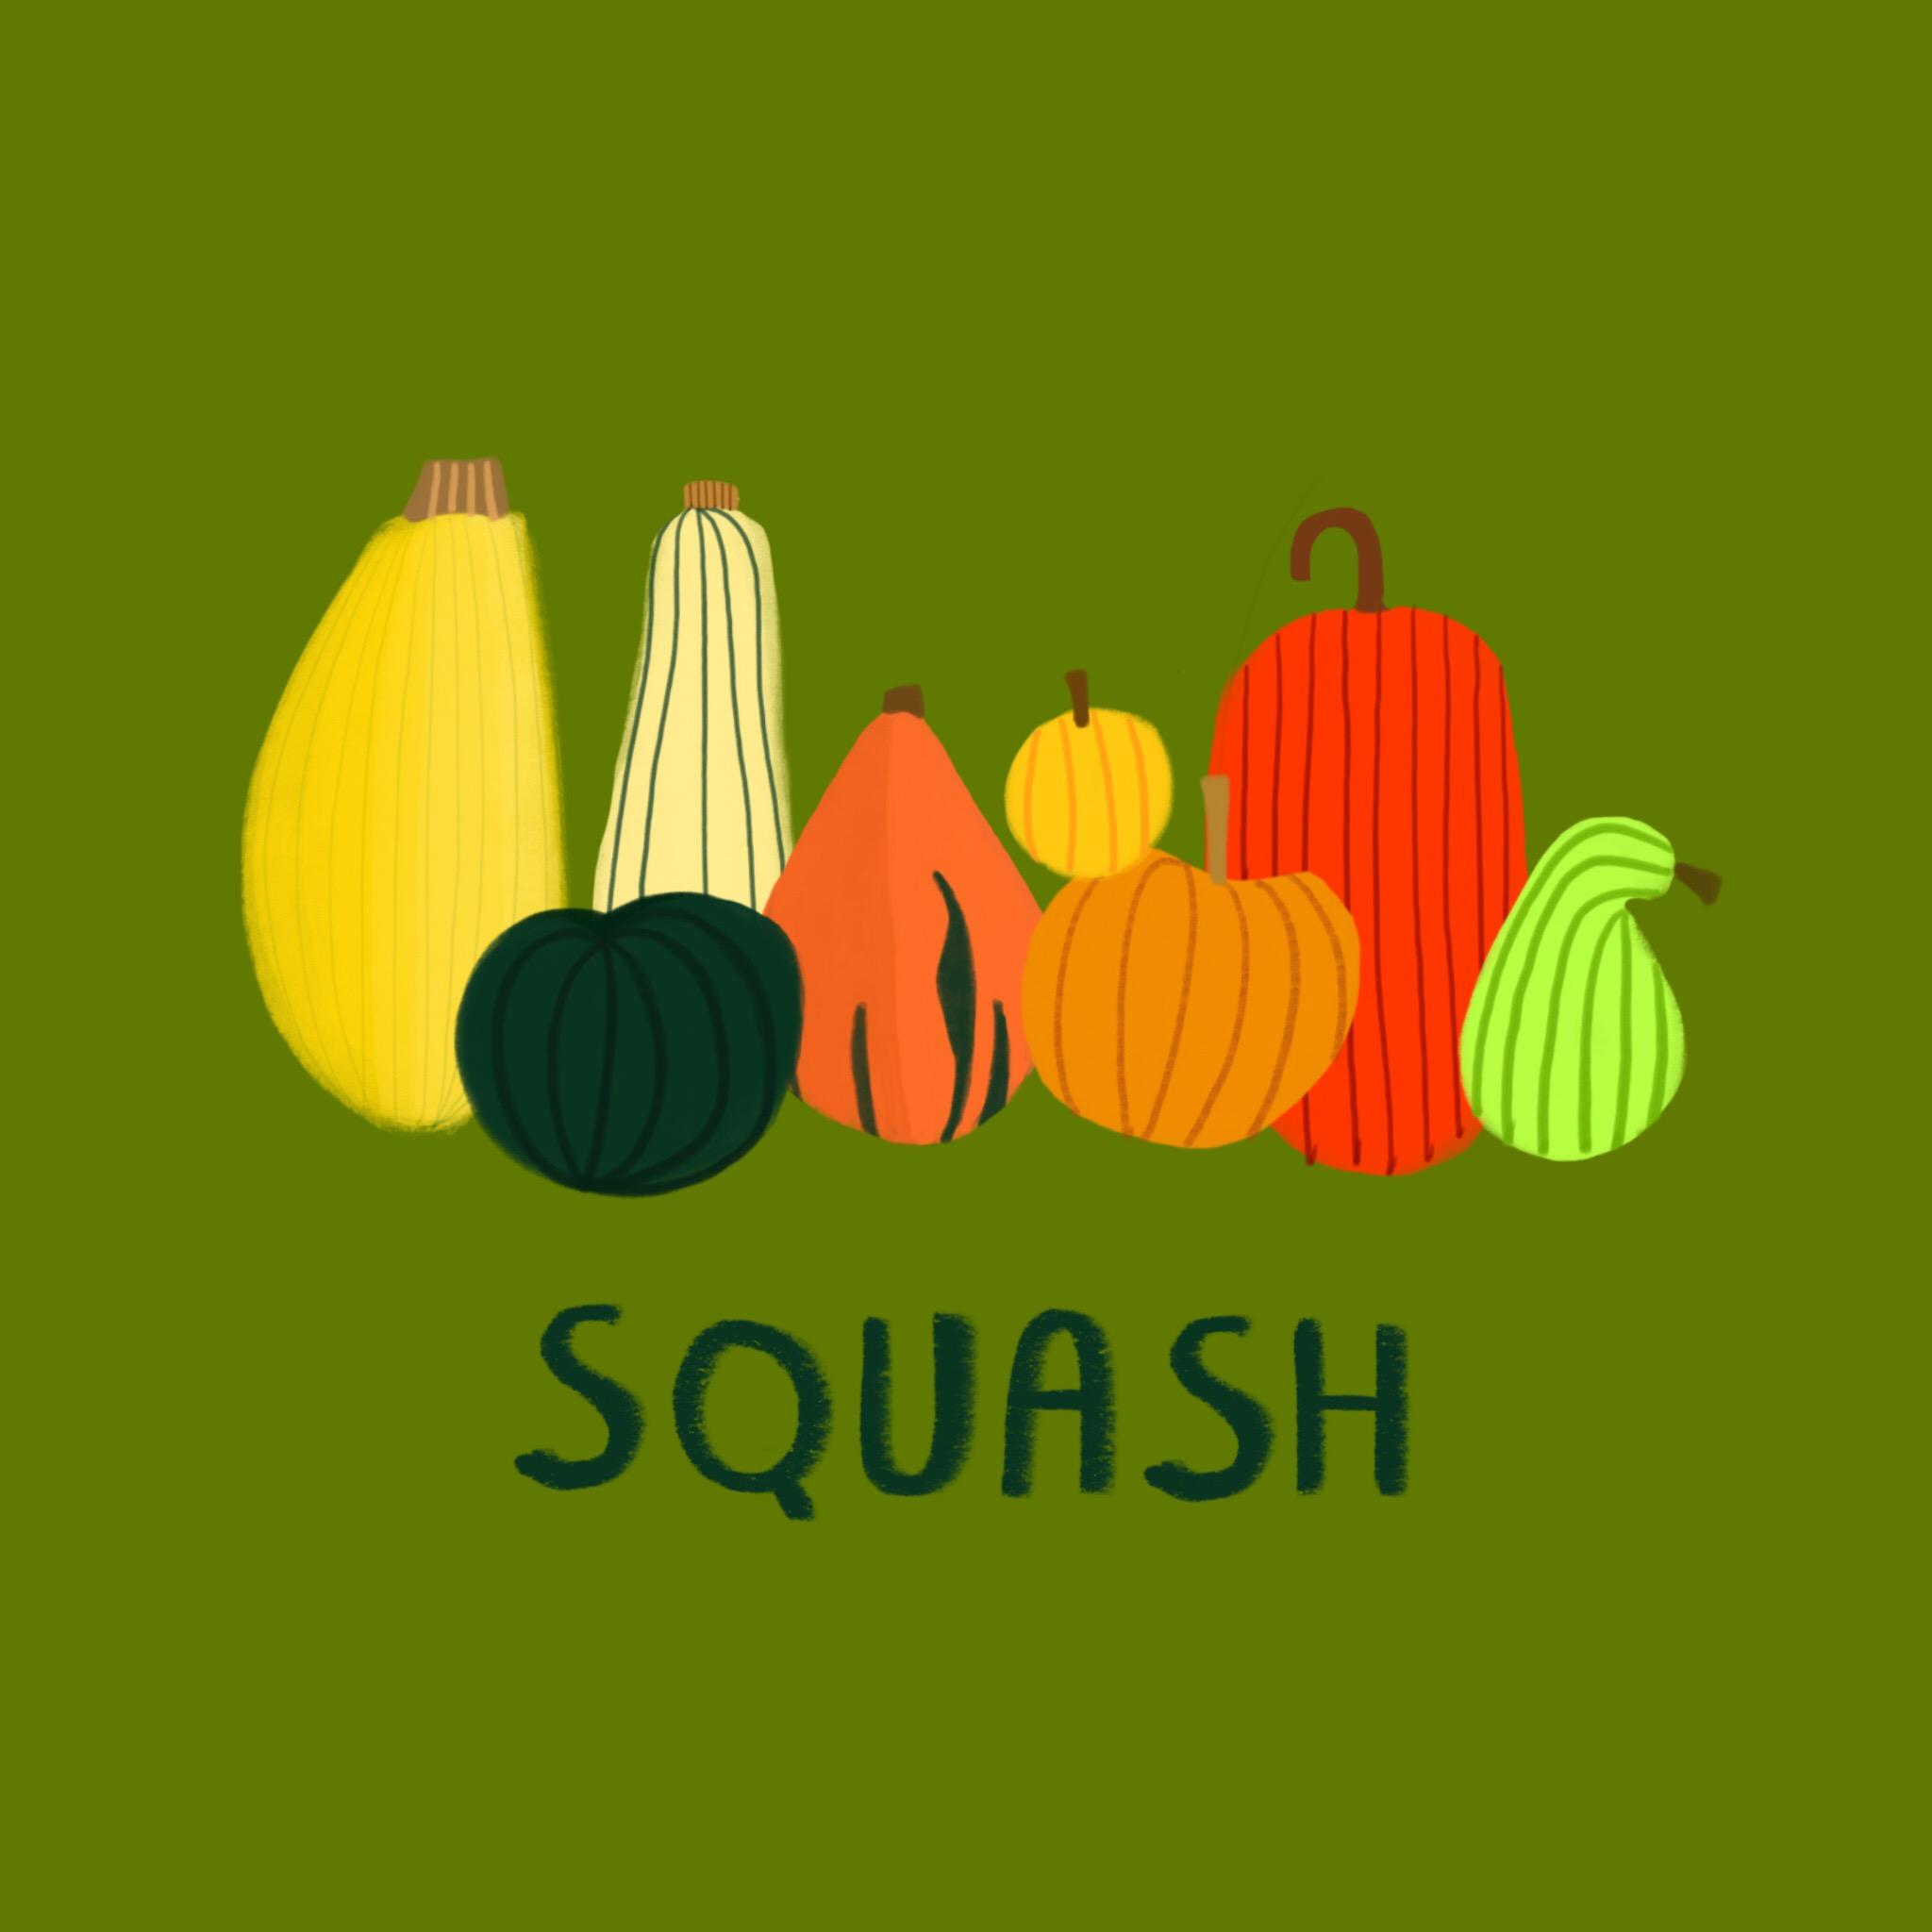 87_-_Winter_Squash.jpg